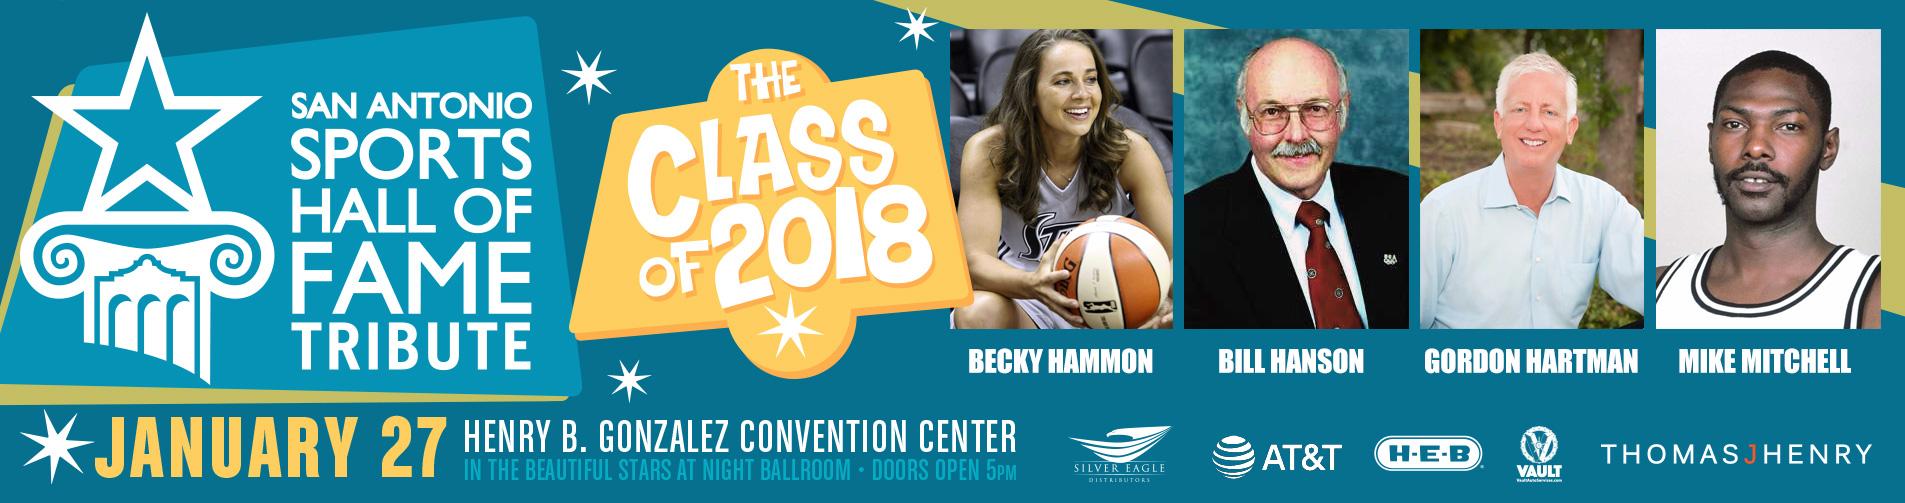 San Antonio Sports Hall of Fame Class of 2018